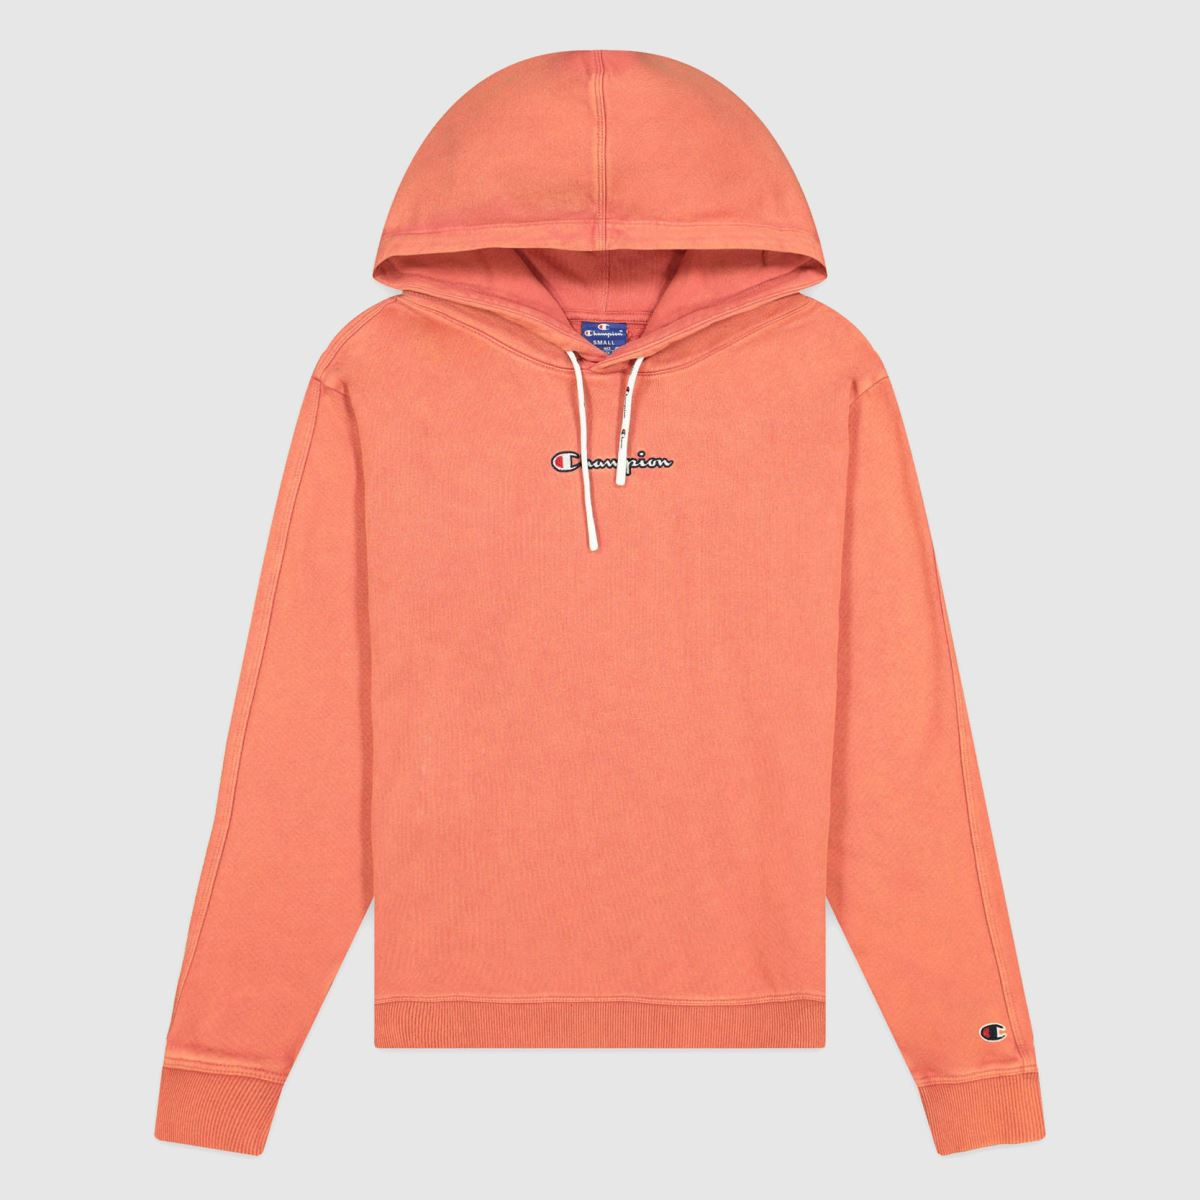 Champion Orange Hooded Sweatshirt